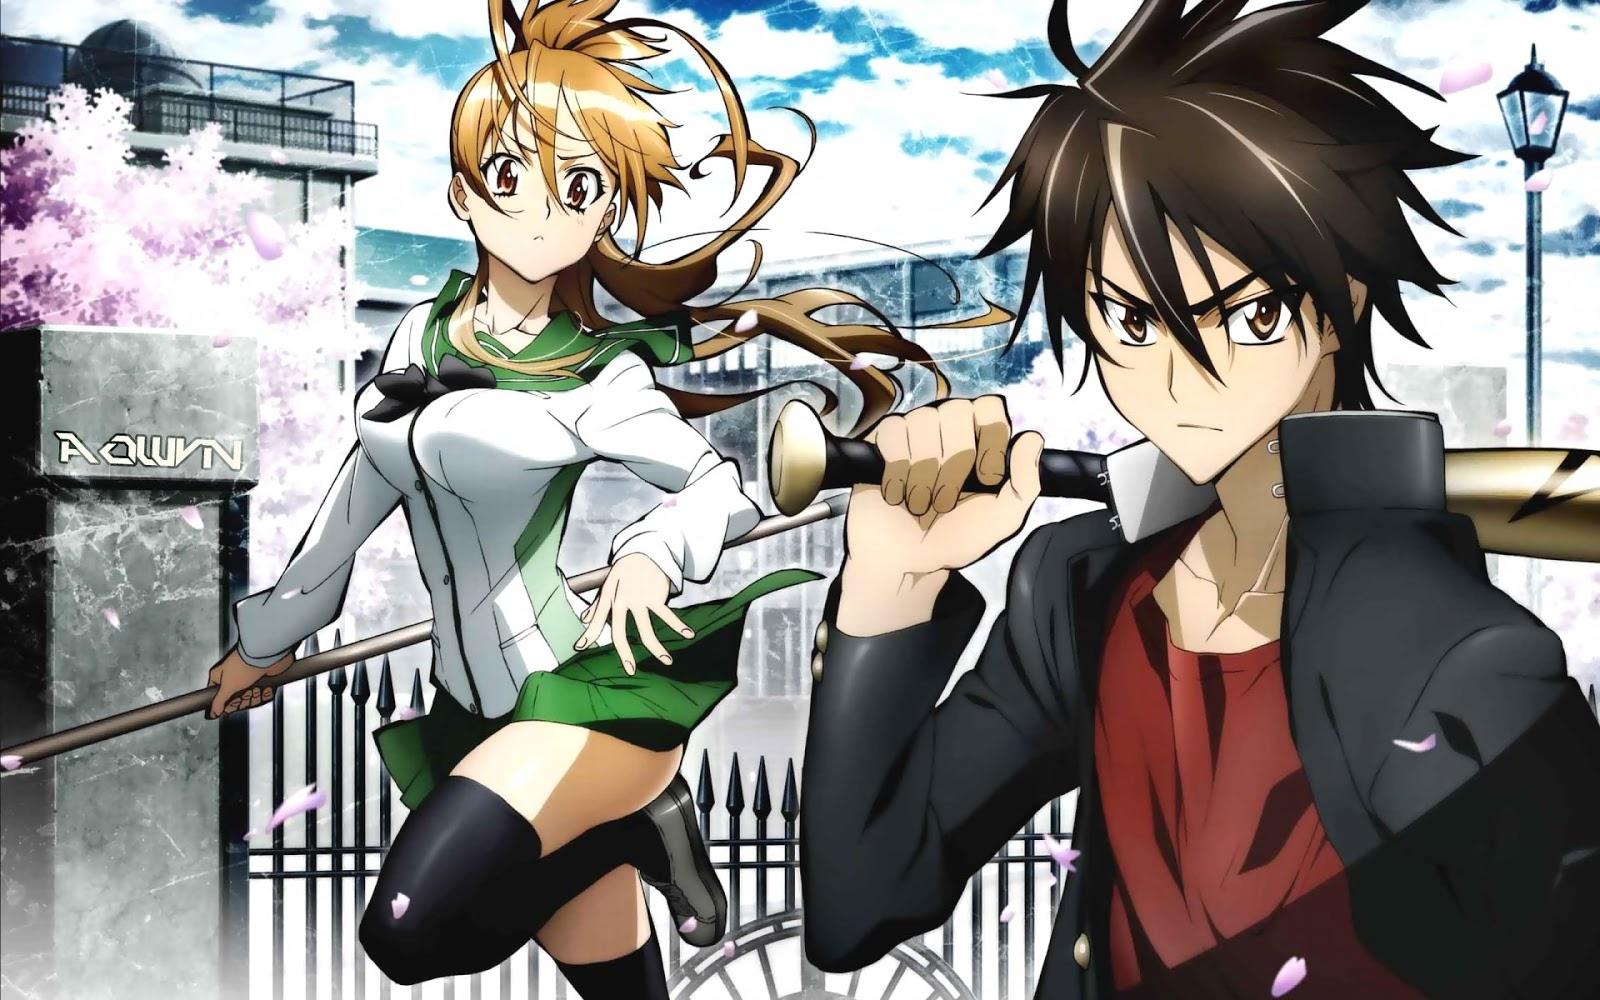 AowVN%2B%25281%2529 - [ Anime 3gp Mp4 ] Highschool of the Dead Bluray | Vietsub - cực cuốn